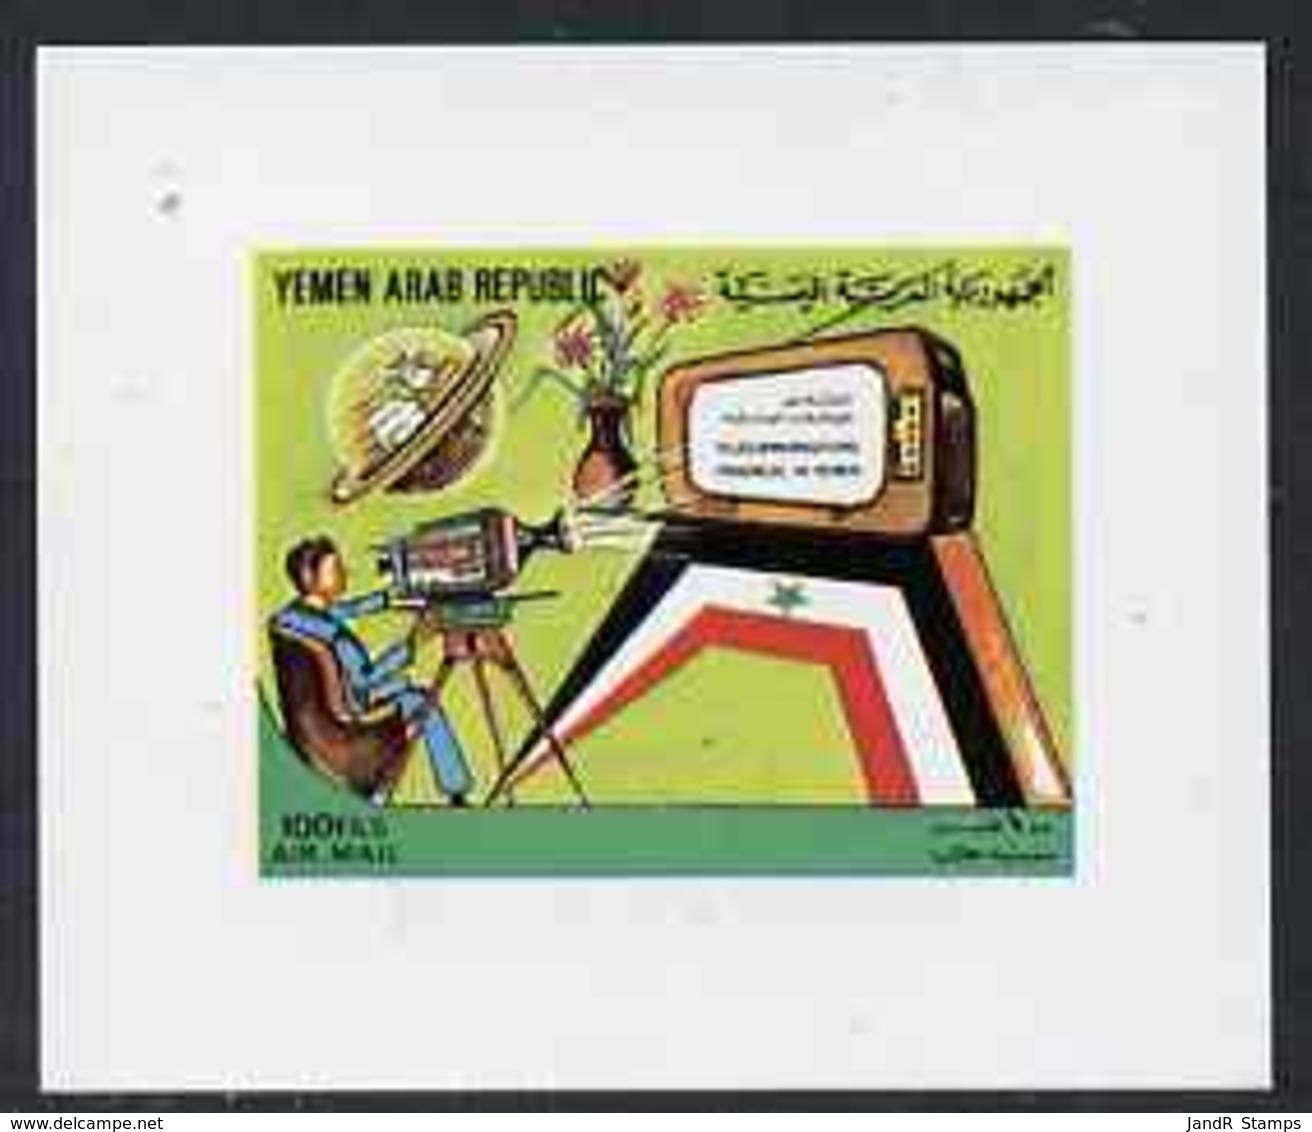 Yemen - Republic 1982 Telecommunications Progress SATELLITES TV 100f Cameraman, TV Screen & Satellite Orbit (design Appe - Yemen